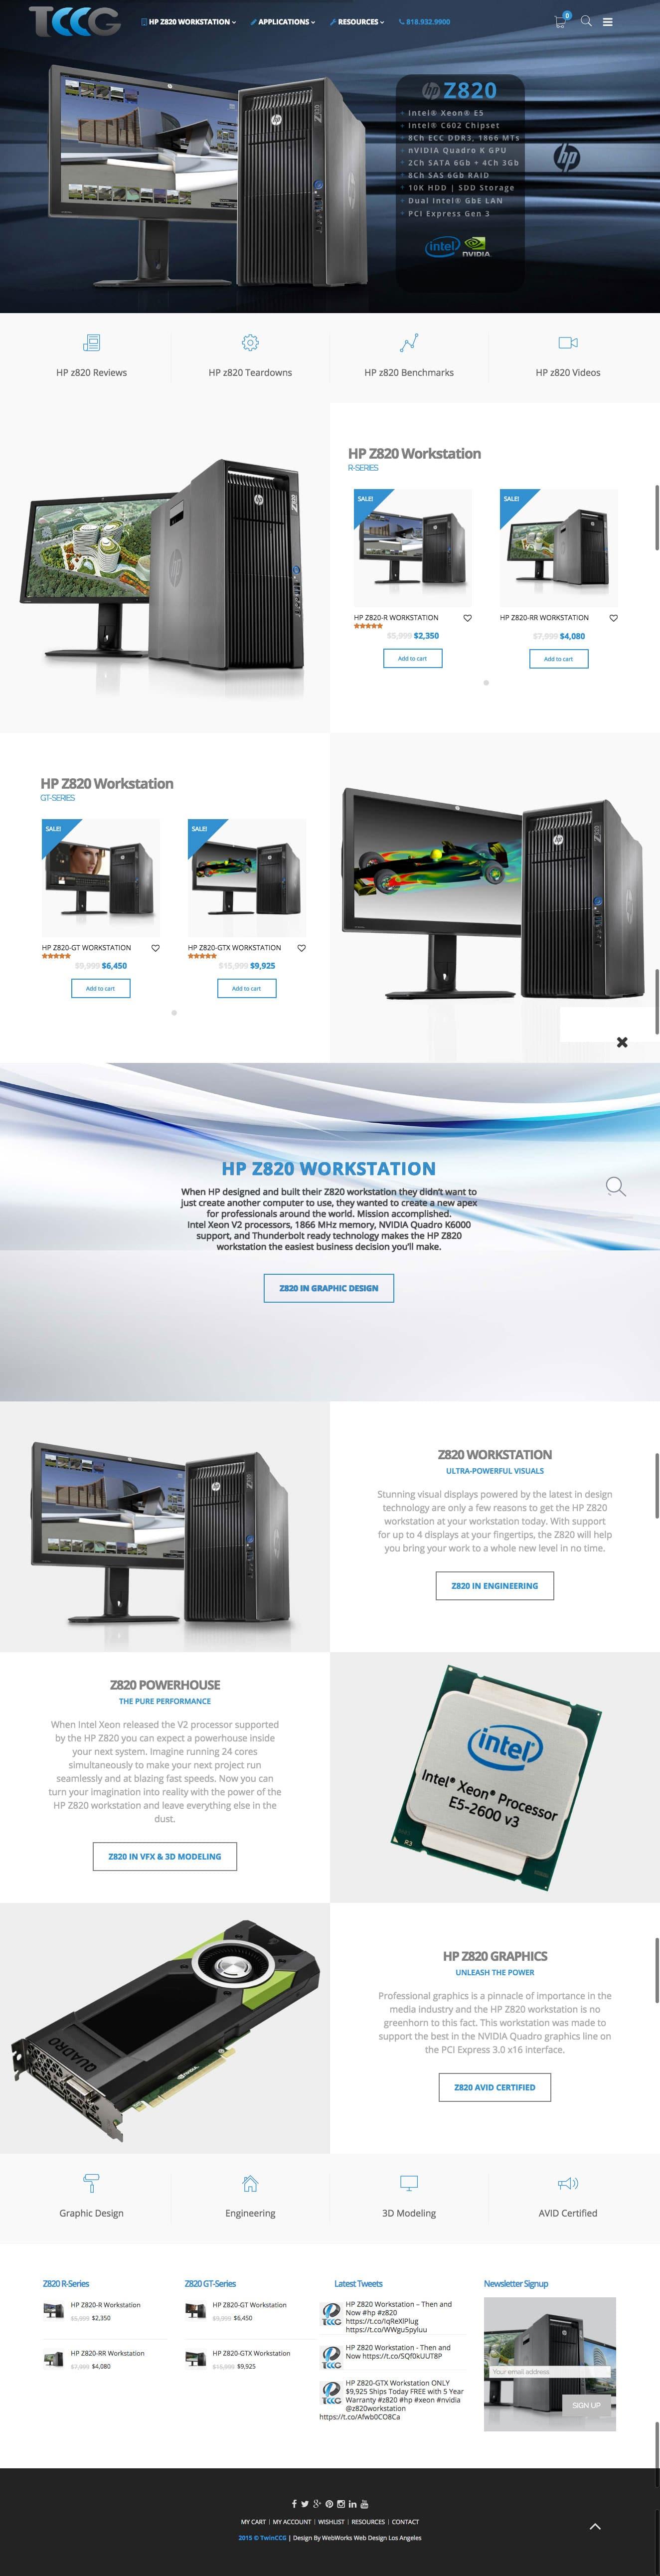 WebWorks Web Design Los Angeles - Twin CCG